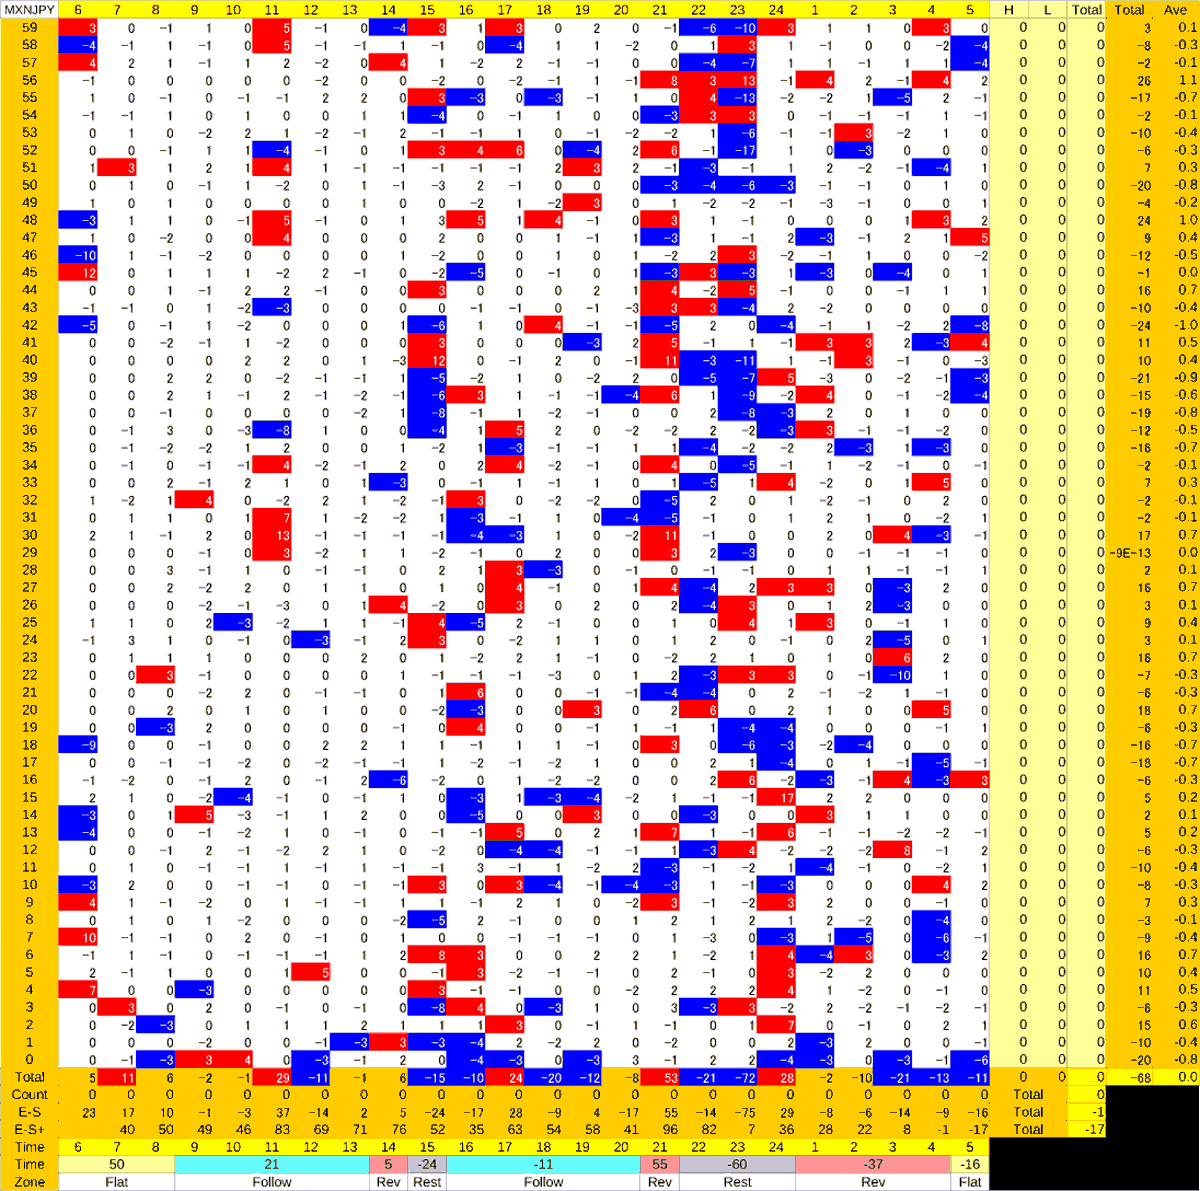 20200616_HS(3)MXNJPY